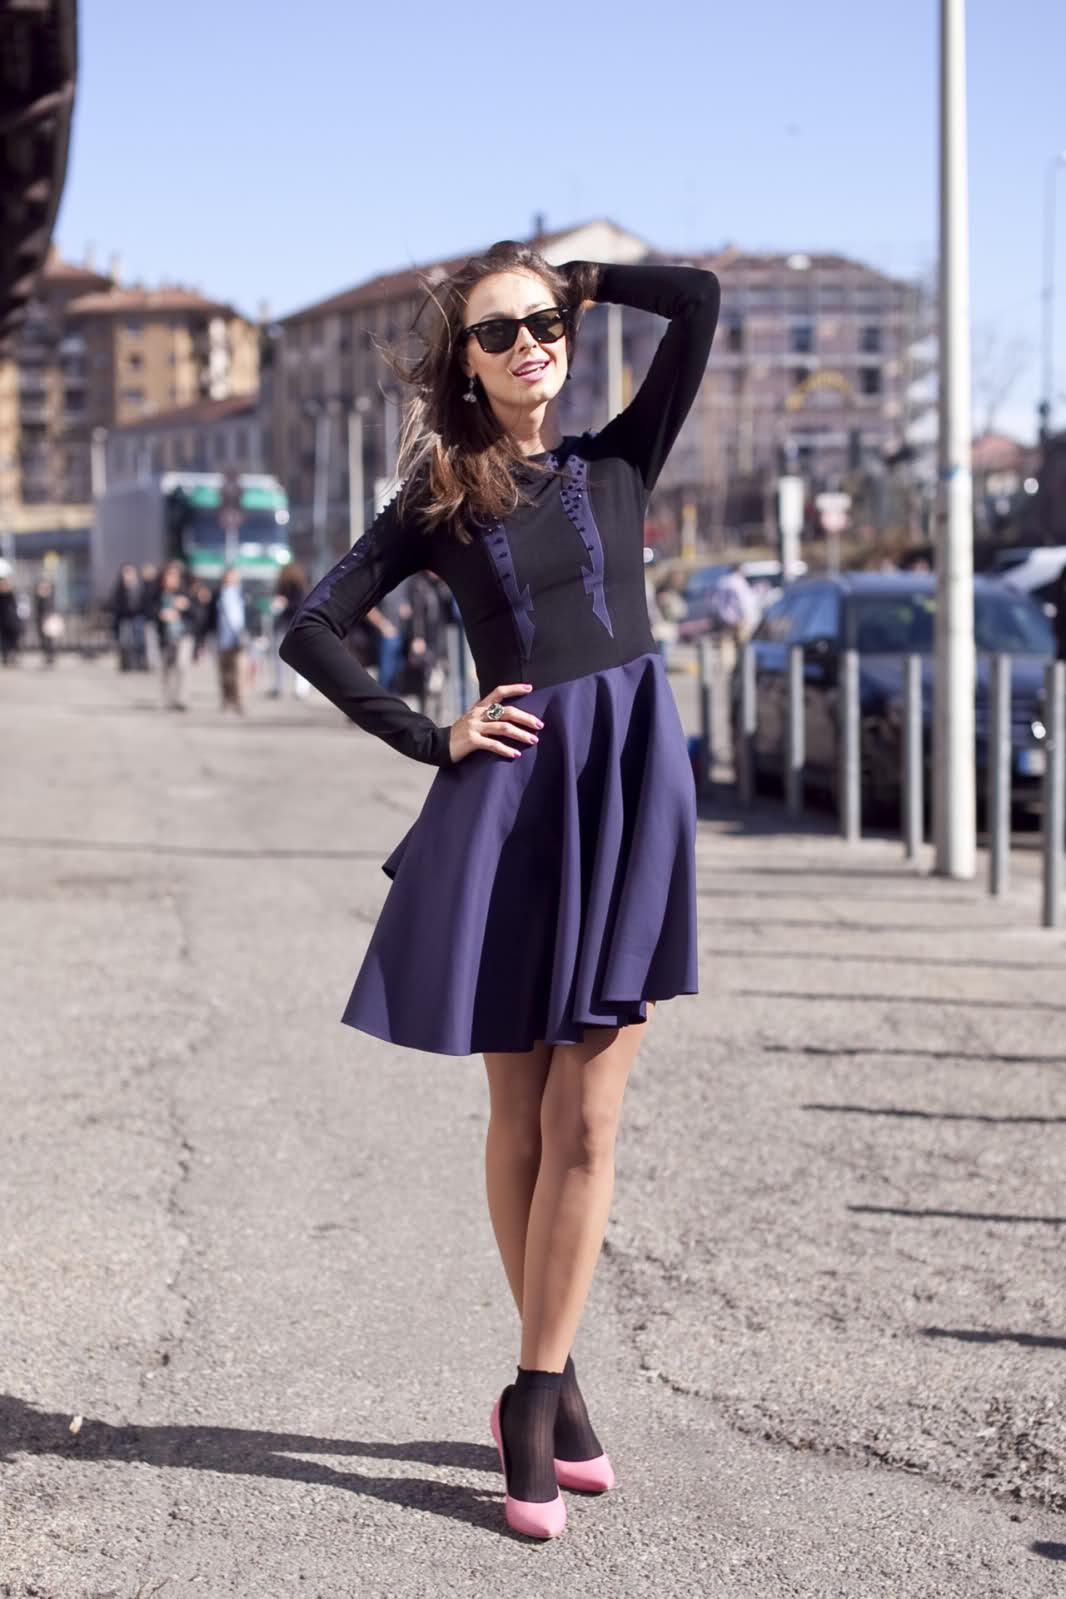 Street StyleDress Trends 2012 For Women